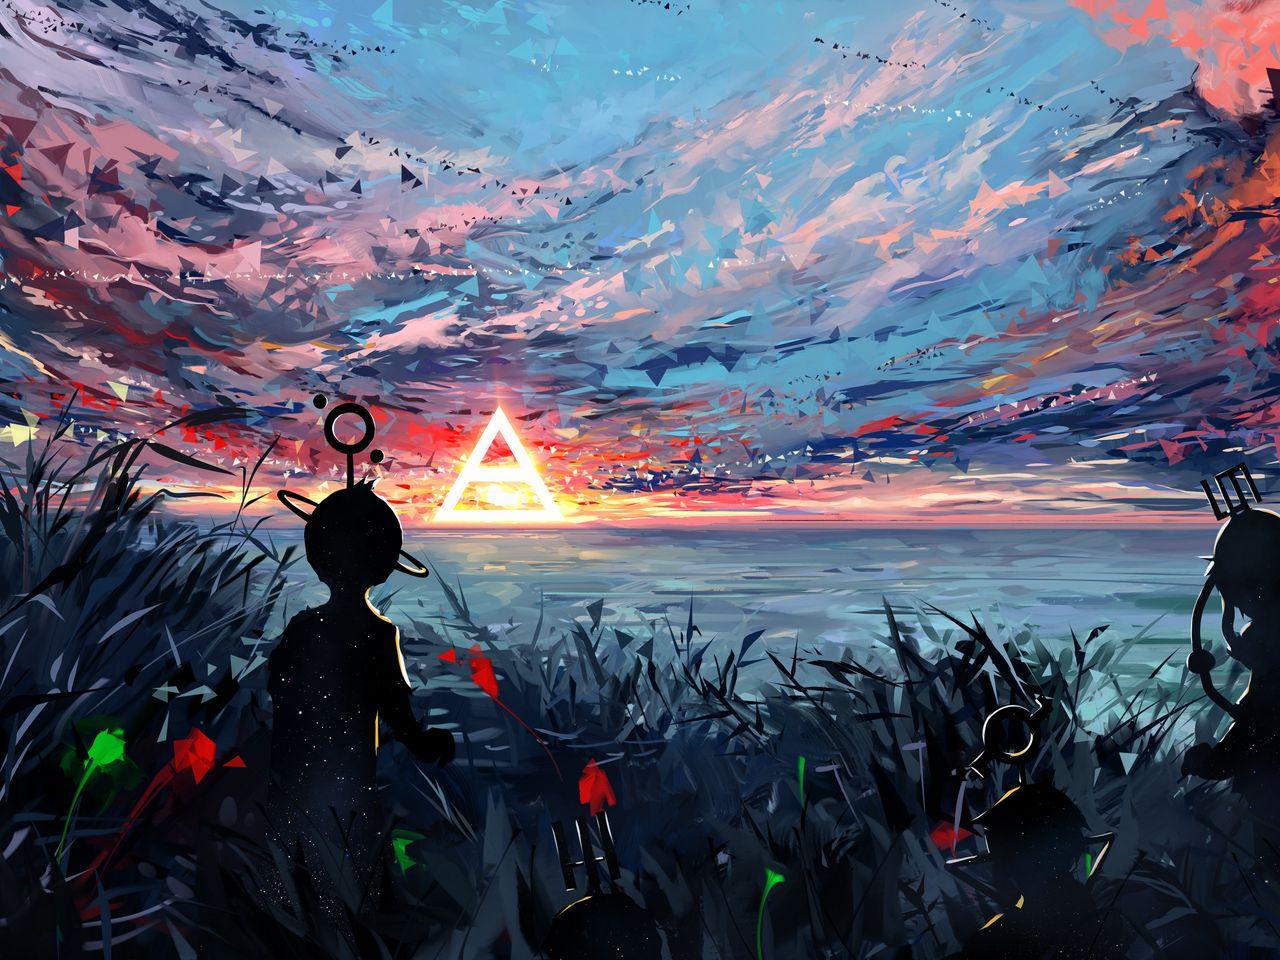 1280x960 Wallpaper silhouette, art, sky, spots, colorful